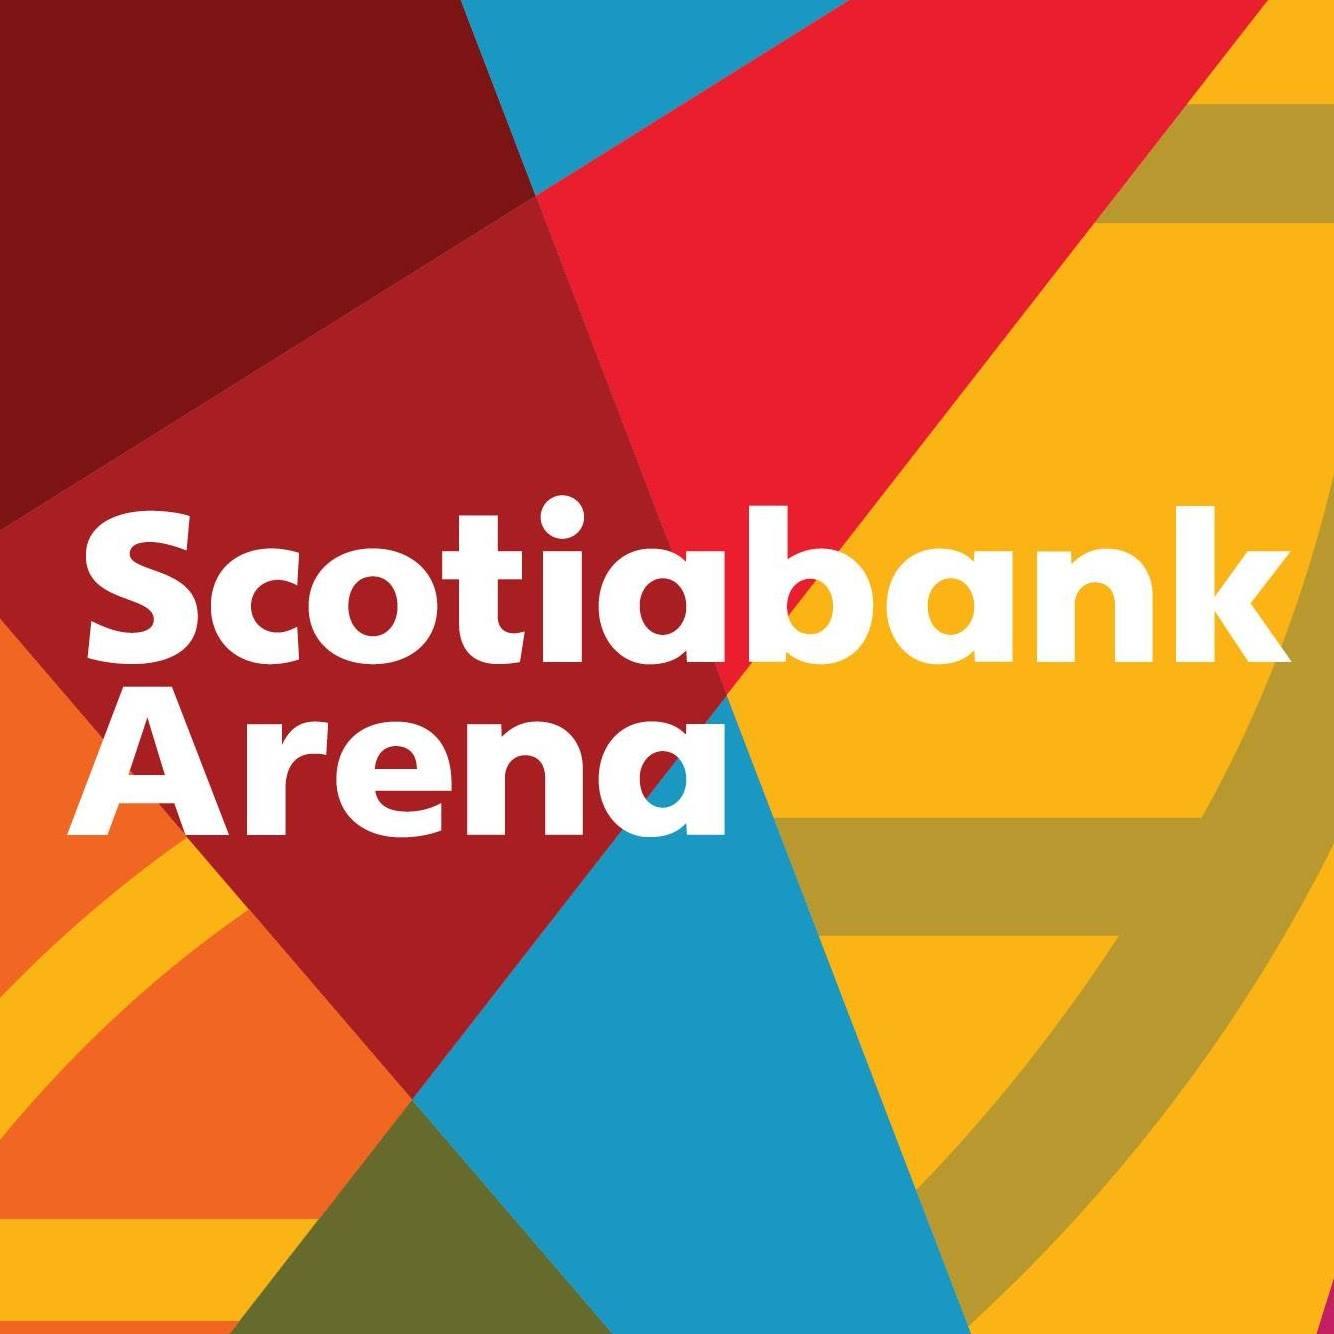 Billets Eric Church - The Gather Again Tour (Scotiabank Arena - Toronto)